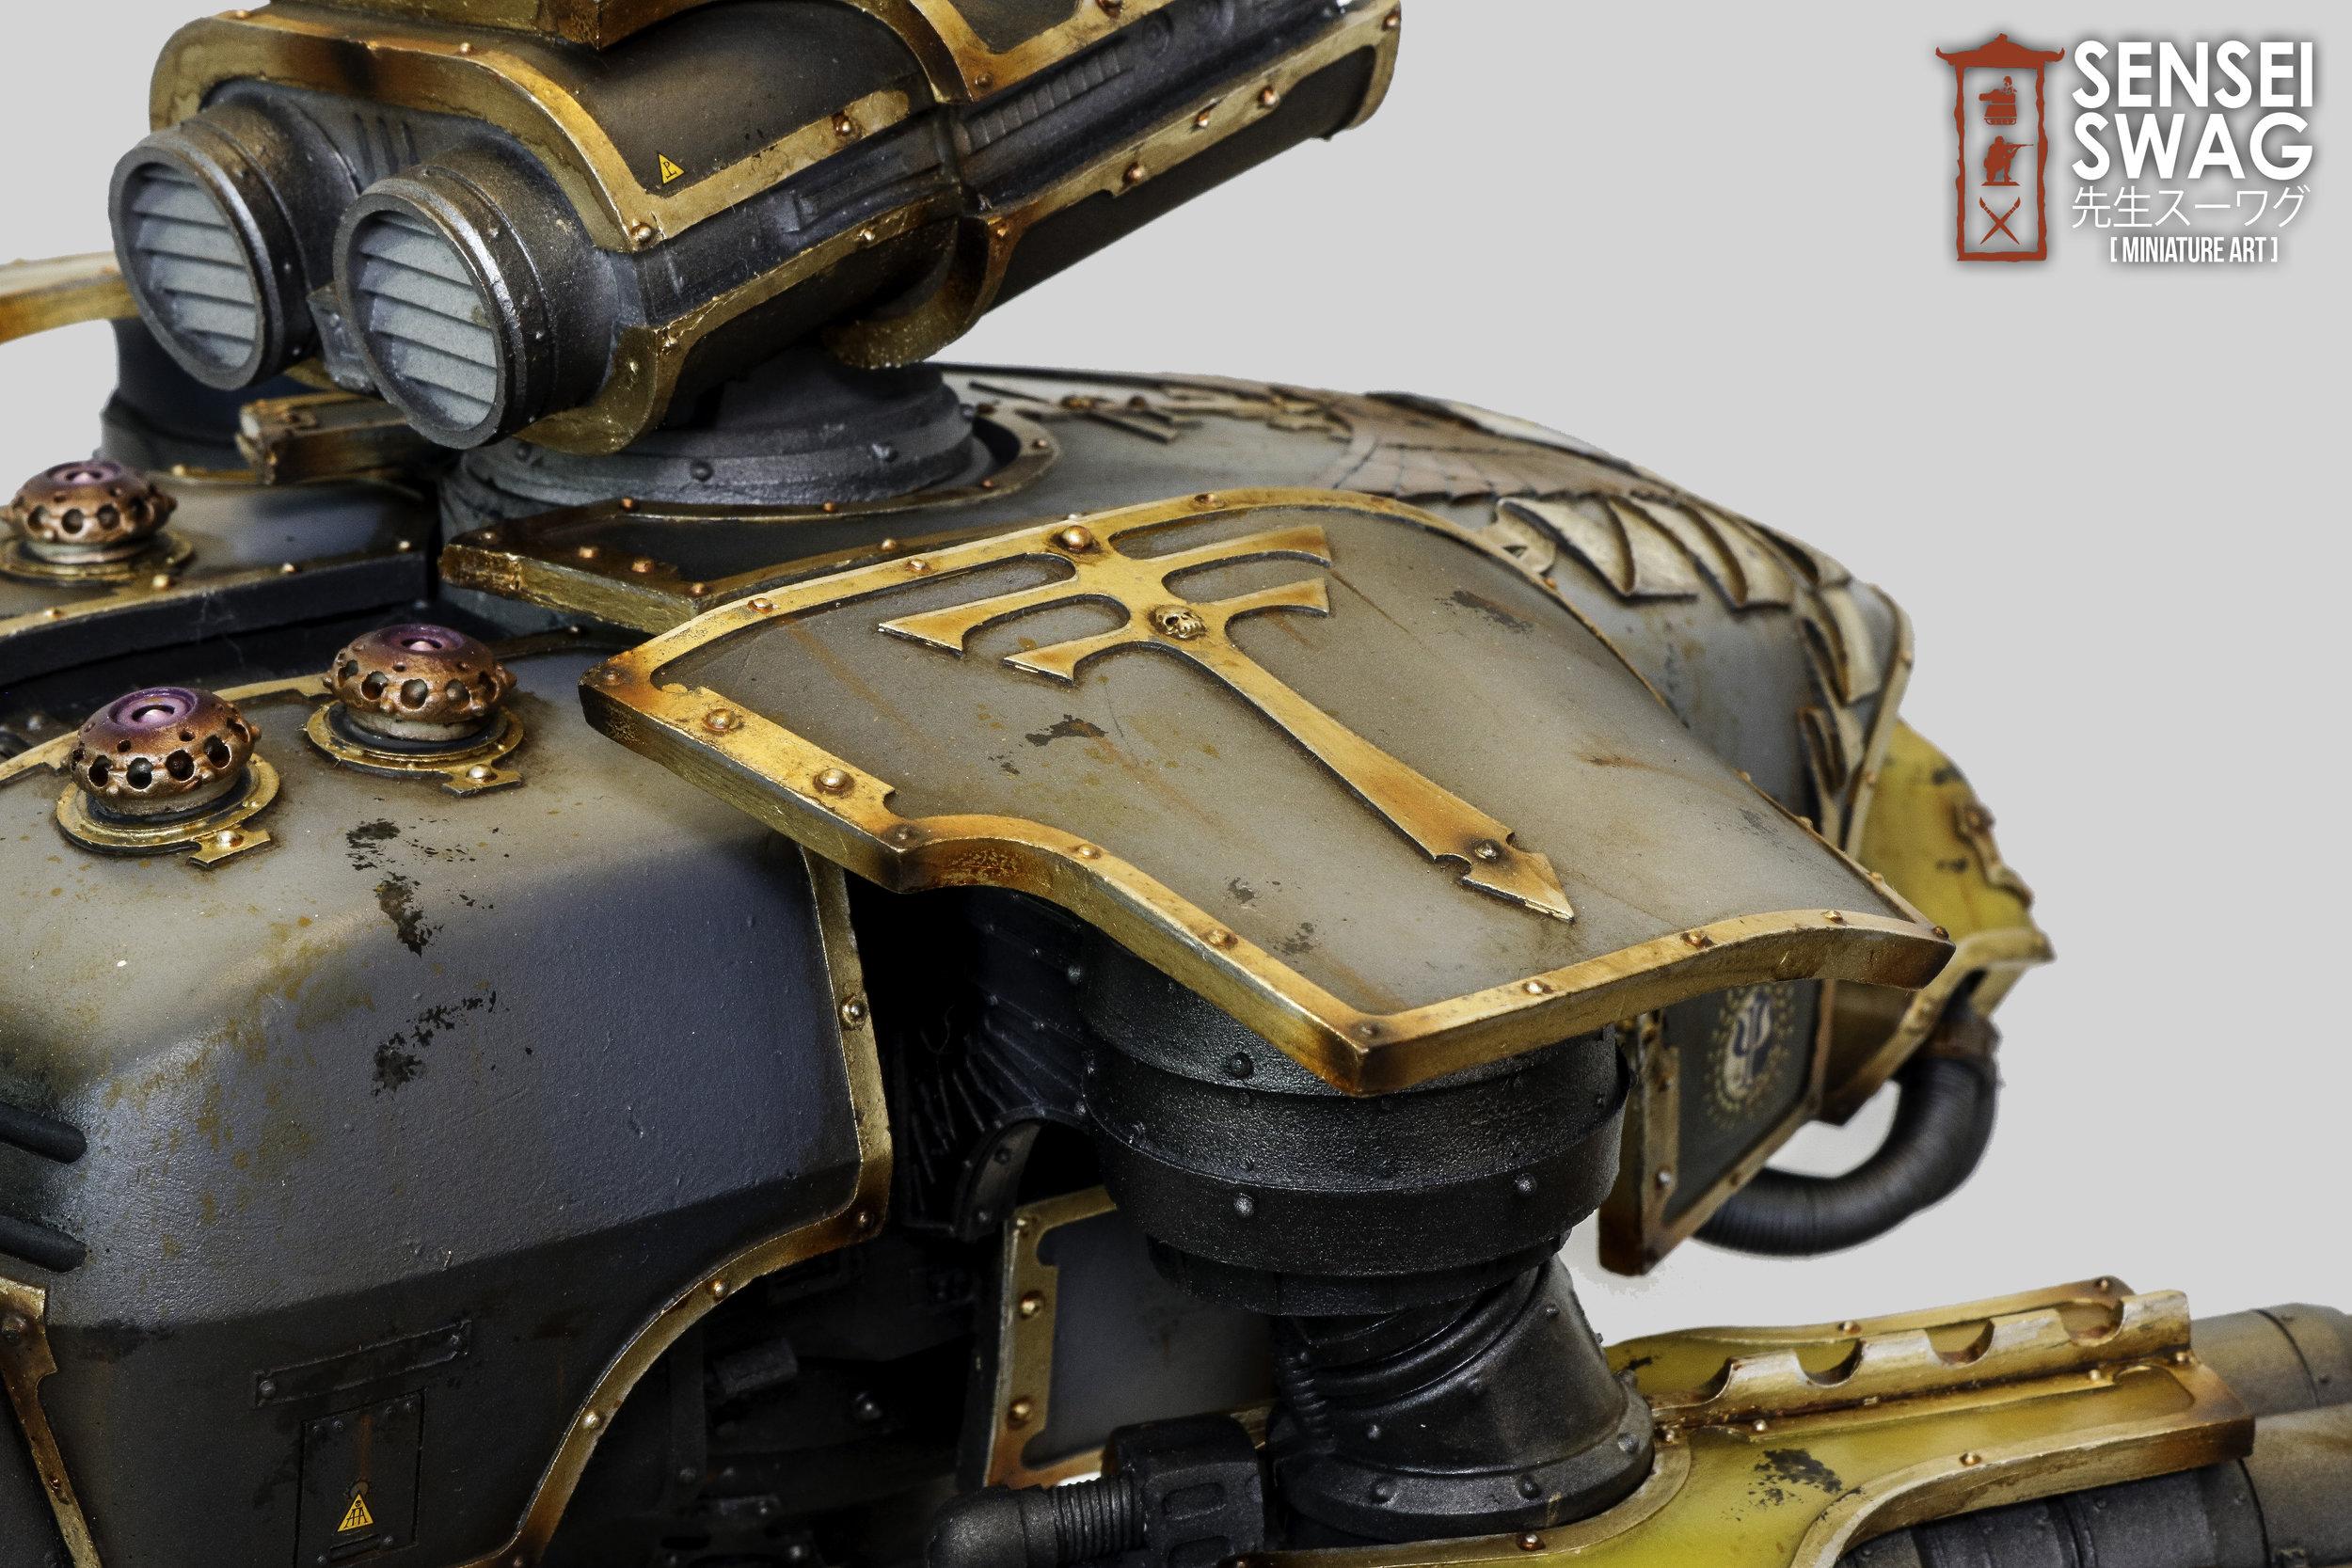 Watermark Legio Gryphonicus Titans Weathered Reaver Warhound-5.jpg